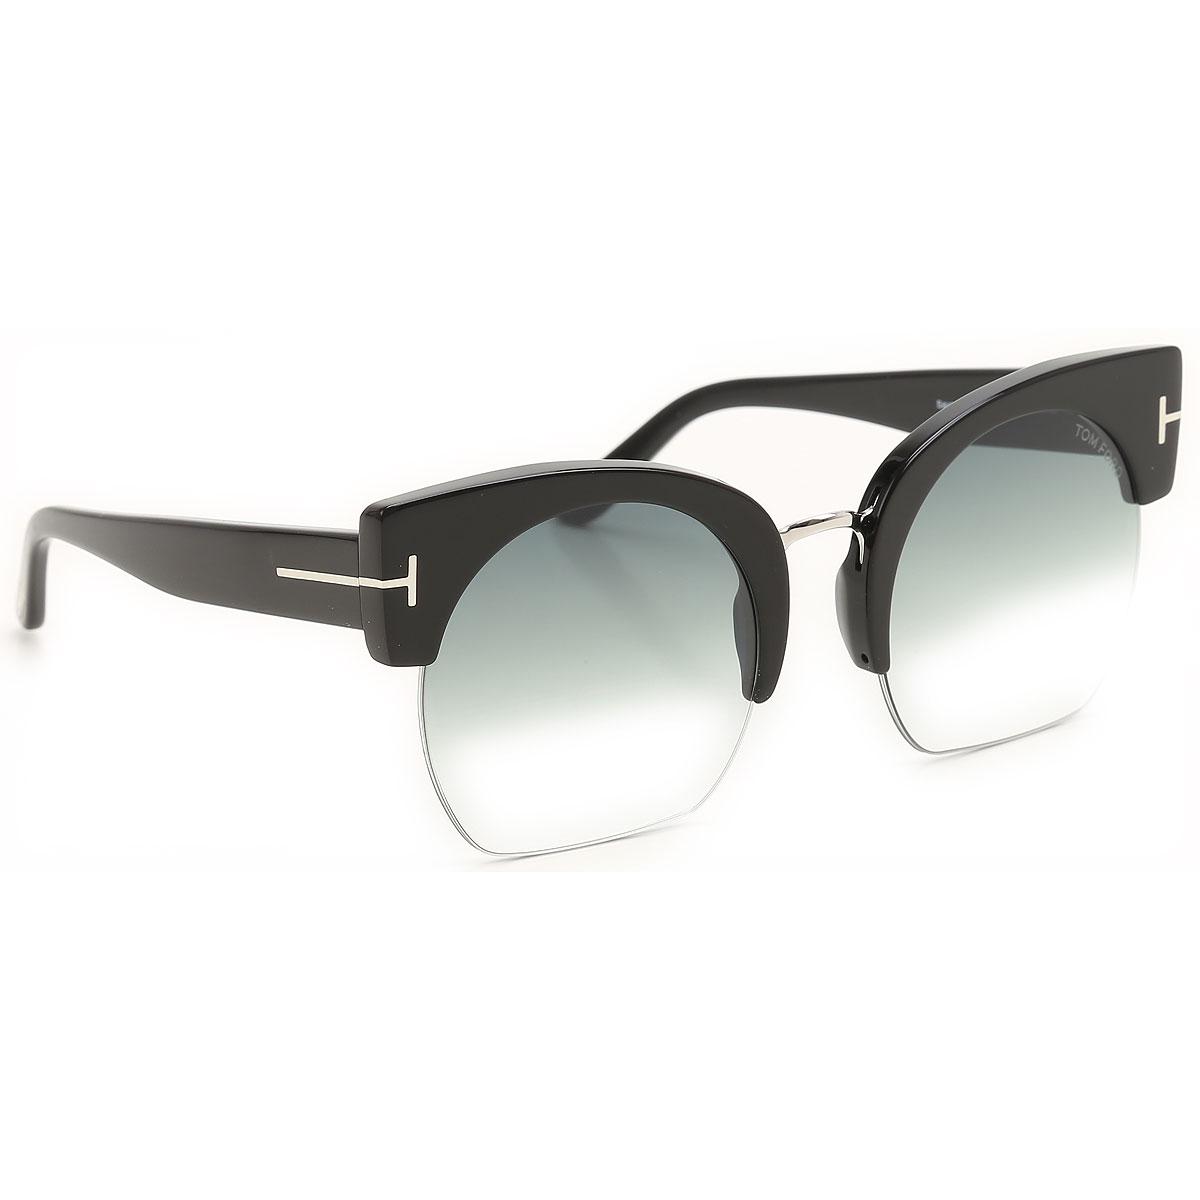 4a6887caaf5ce Güneş Gözlükleri Tom Ford